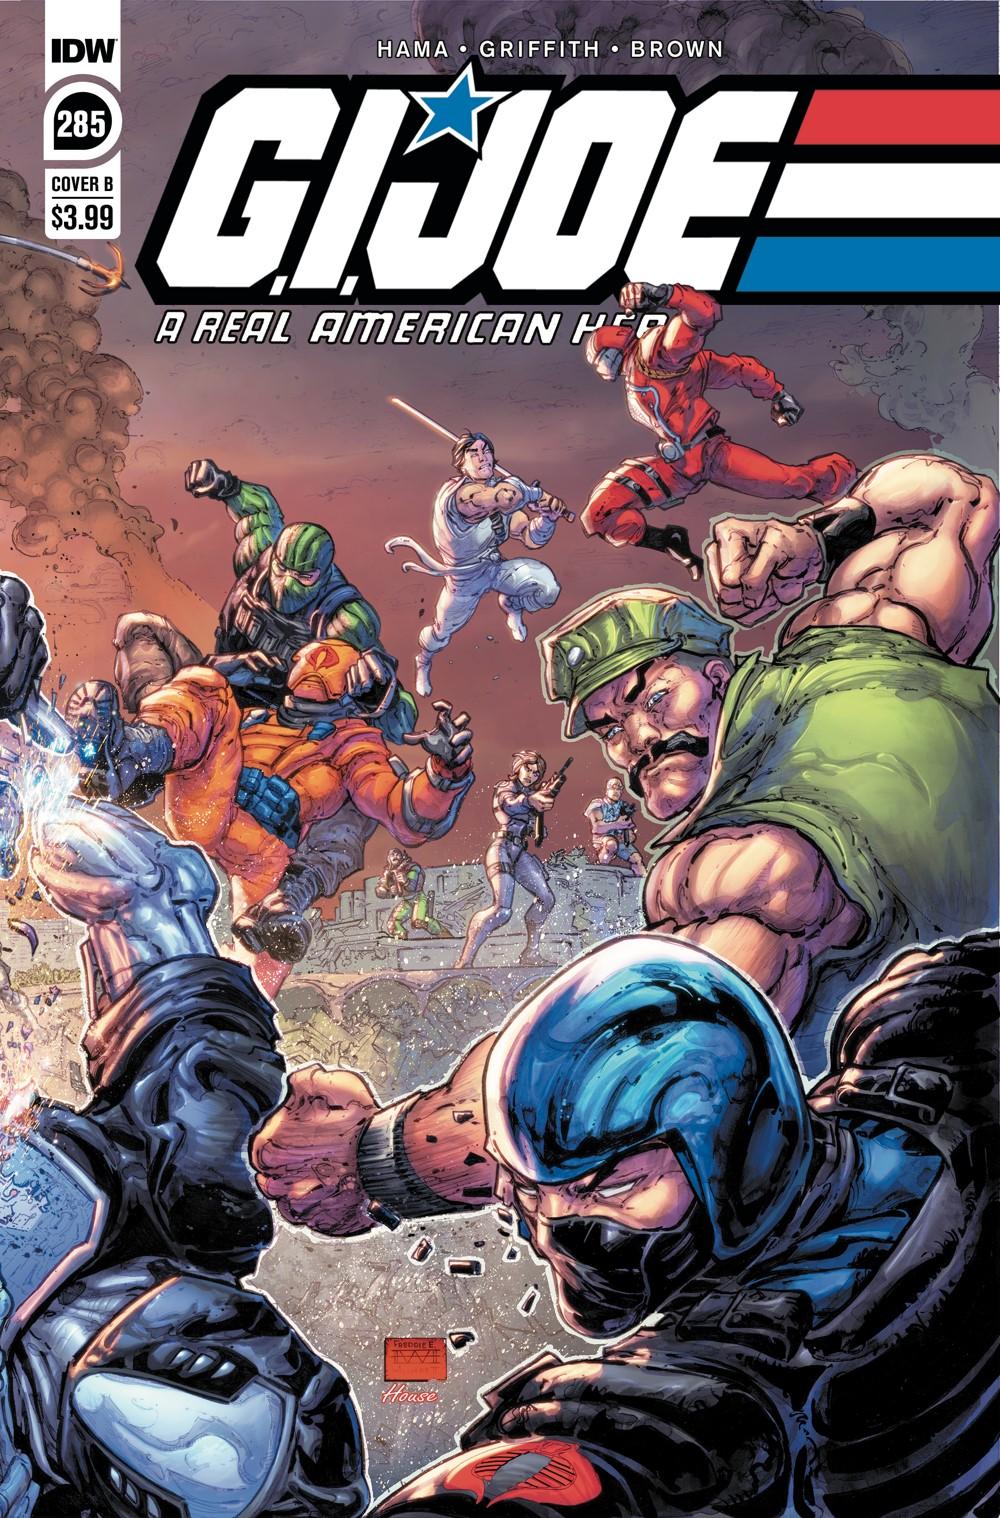 GIJoeRAH285-coverB ComicList Previews: G.I. JOE A REAL AMERICAN HERO #285